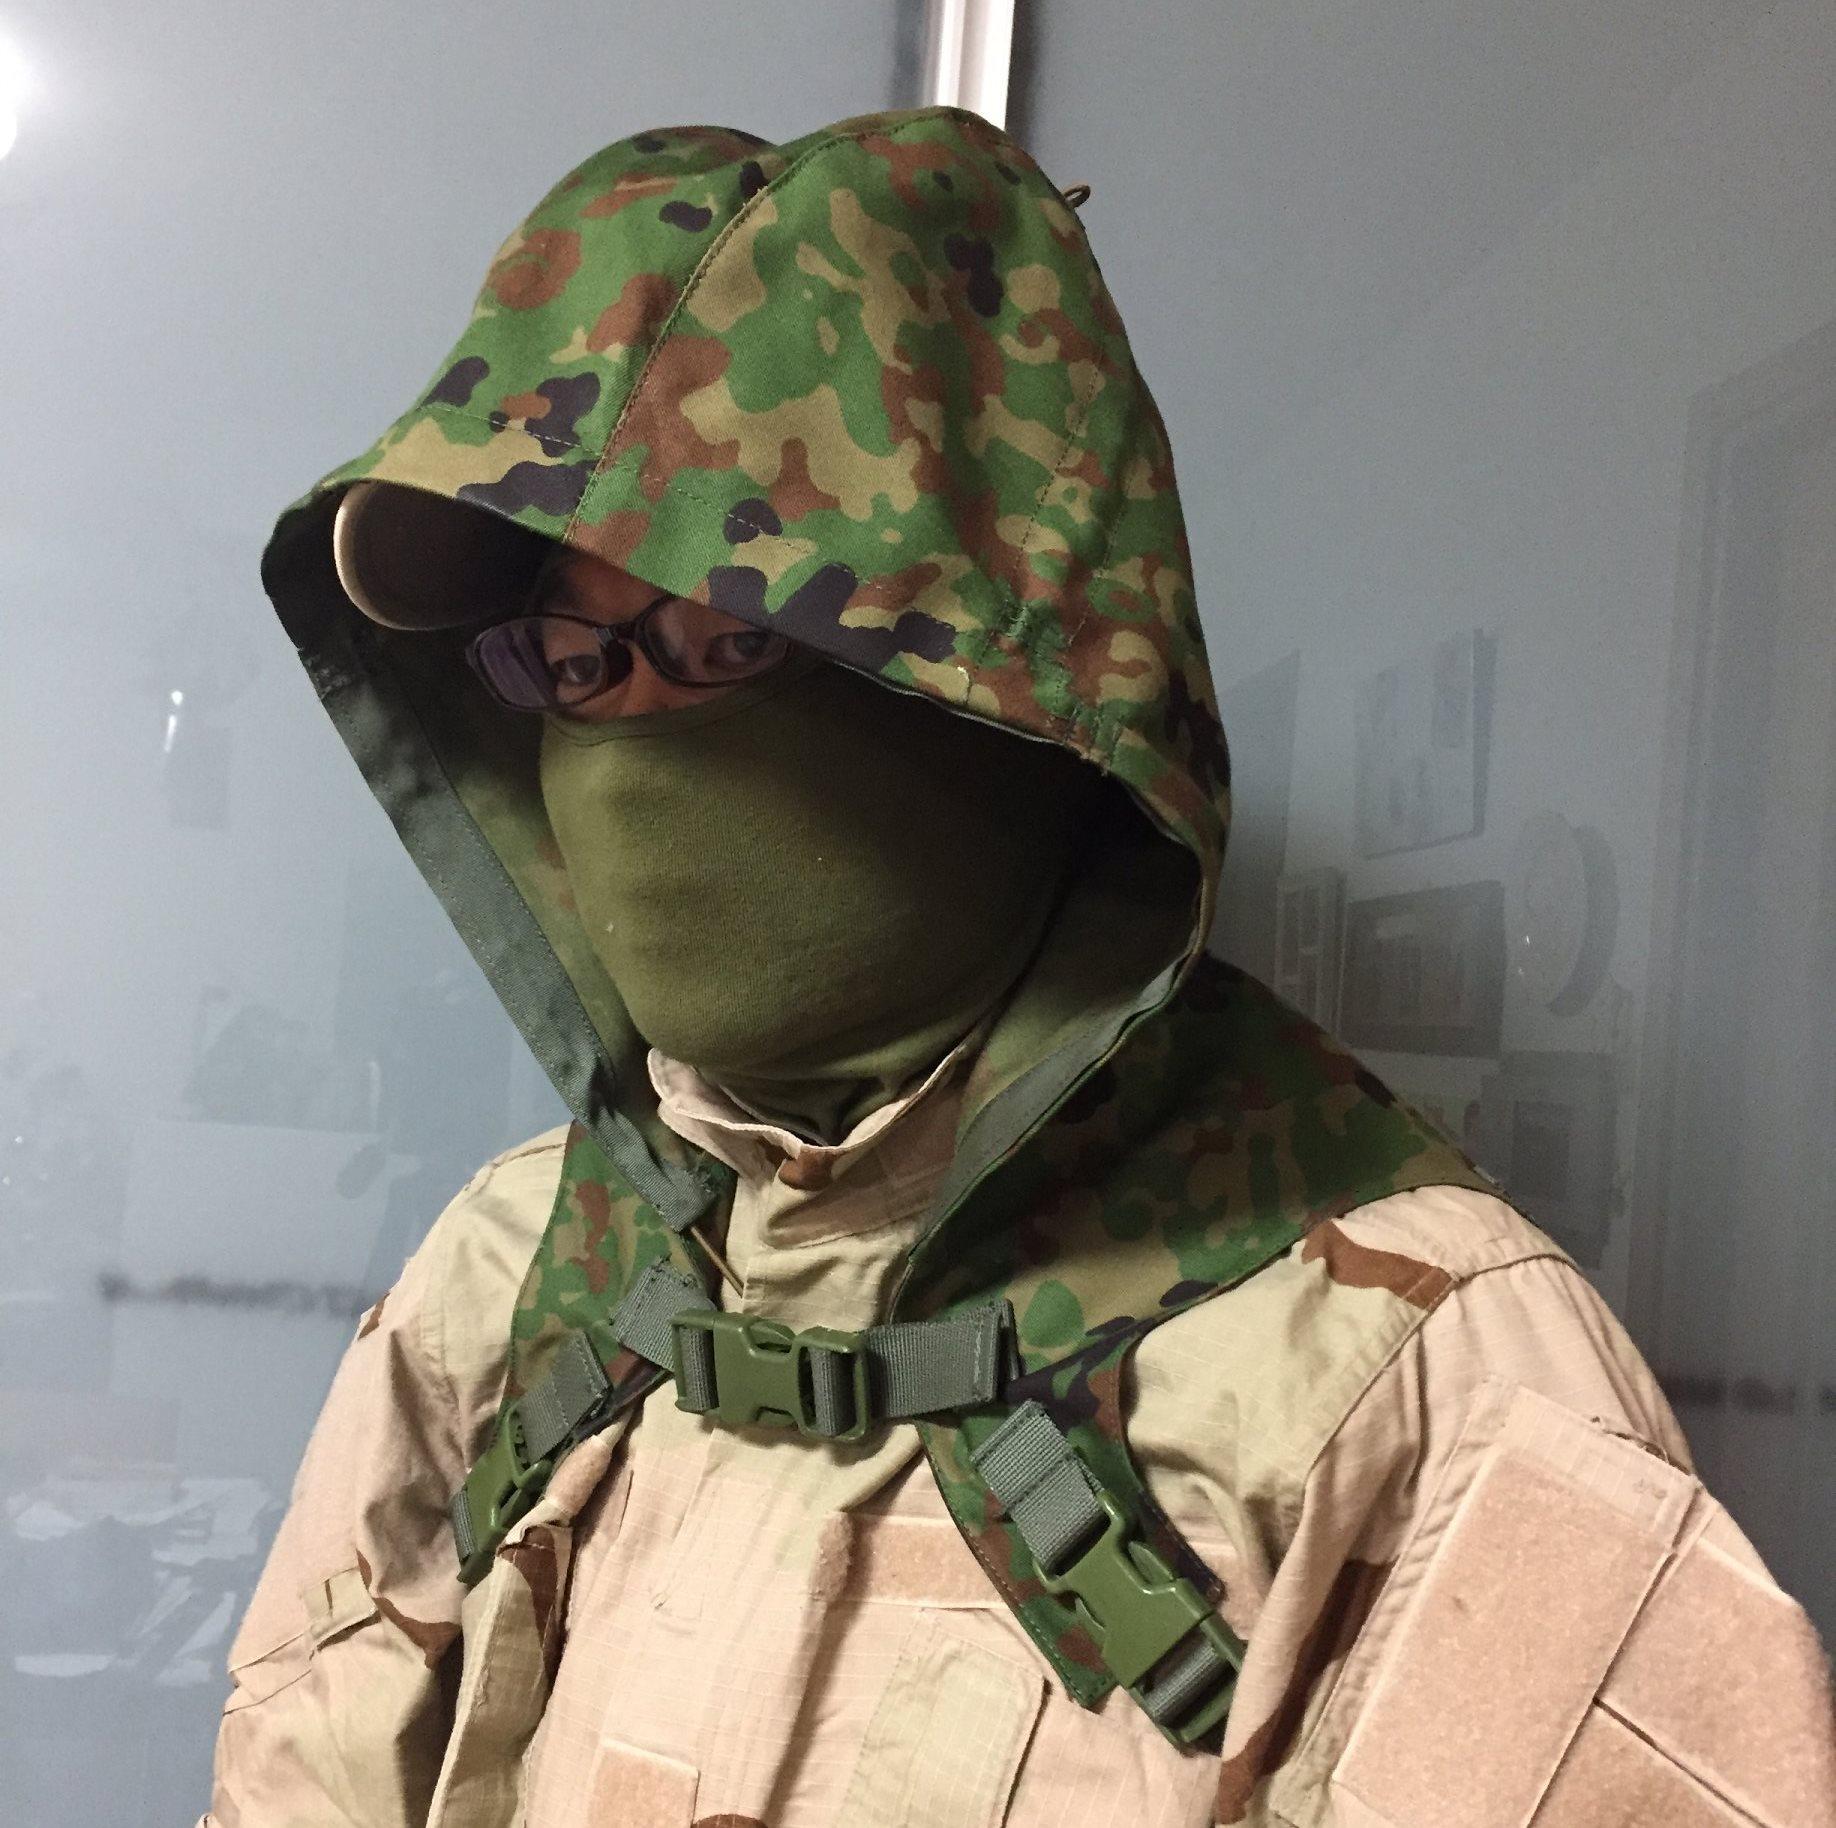 Sukerucom南蛮堂コラボ商品 SDF Tactical Alone Hood タクティカルアローンフード陸自迷彩